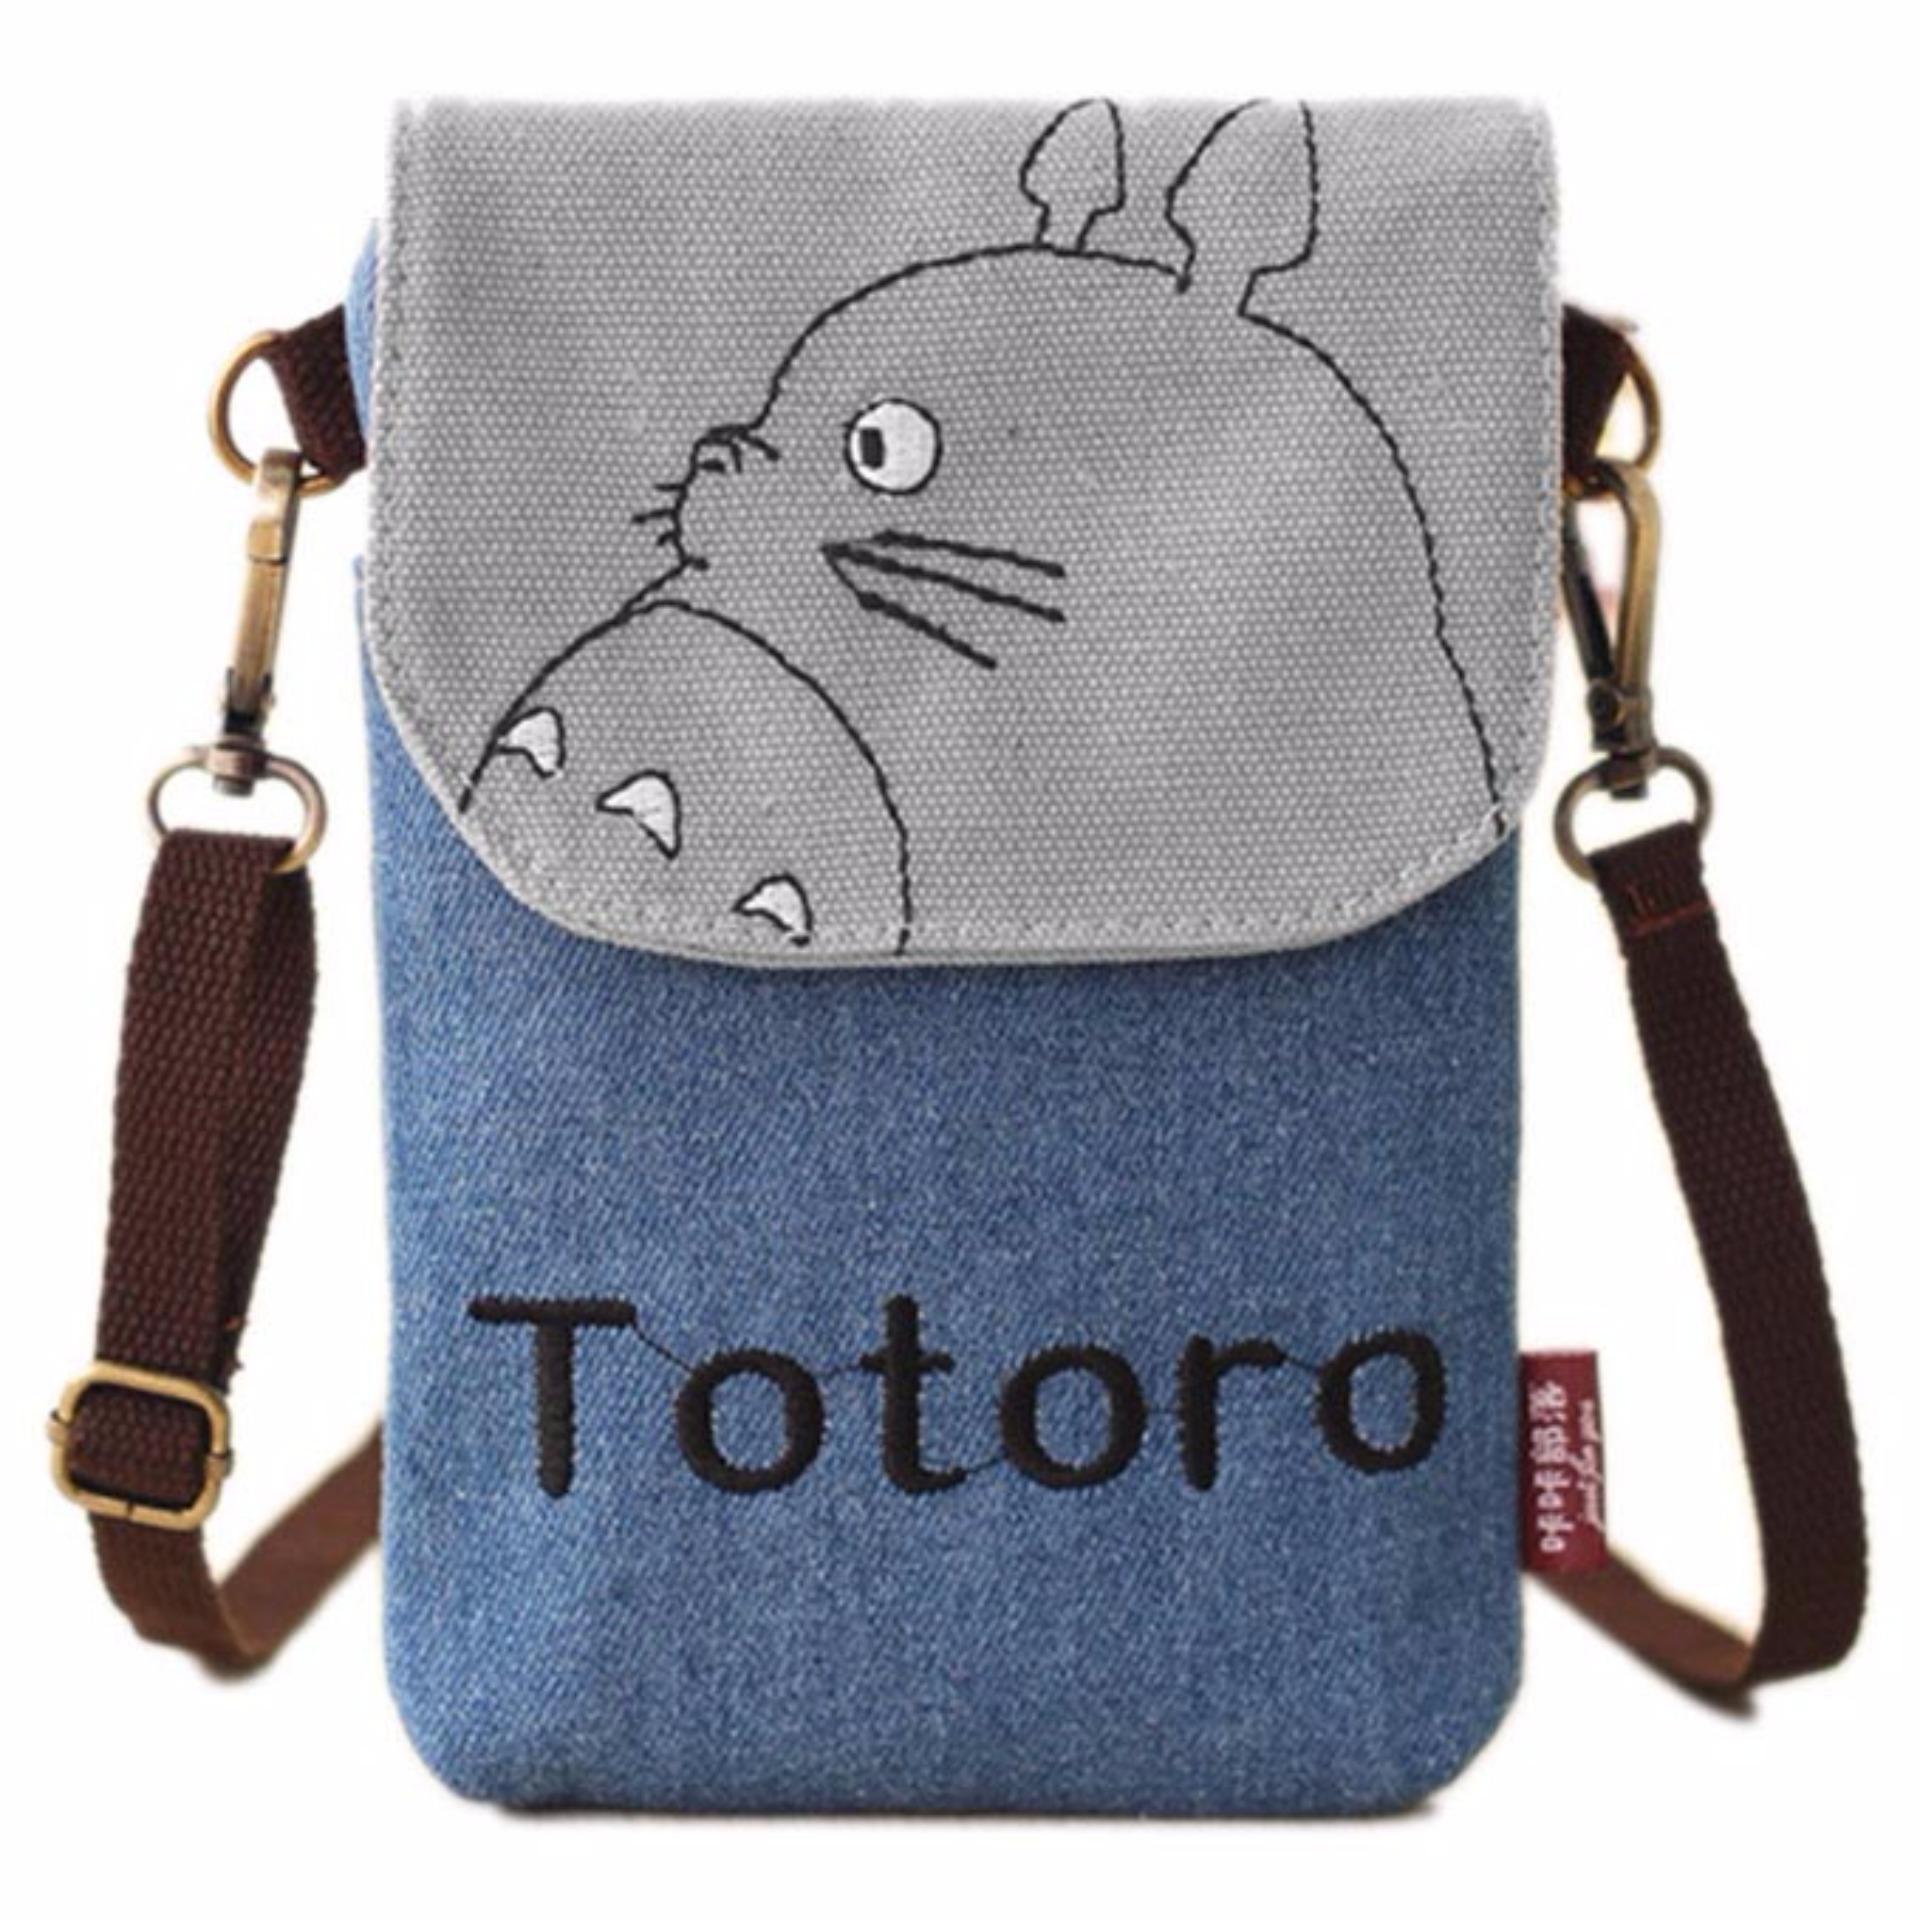 Promo Toko Tas Selempang Model Totoro Blue